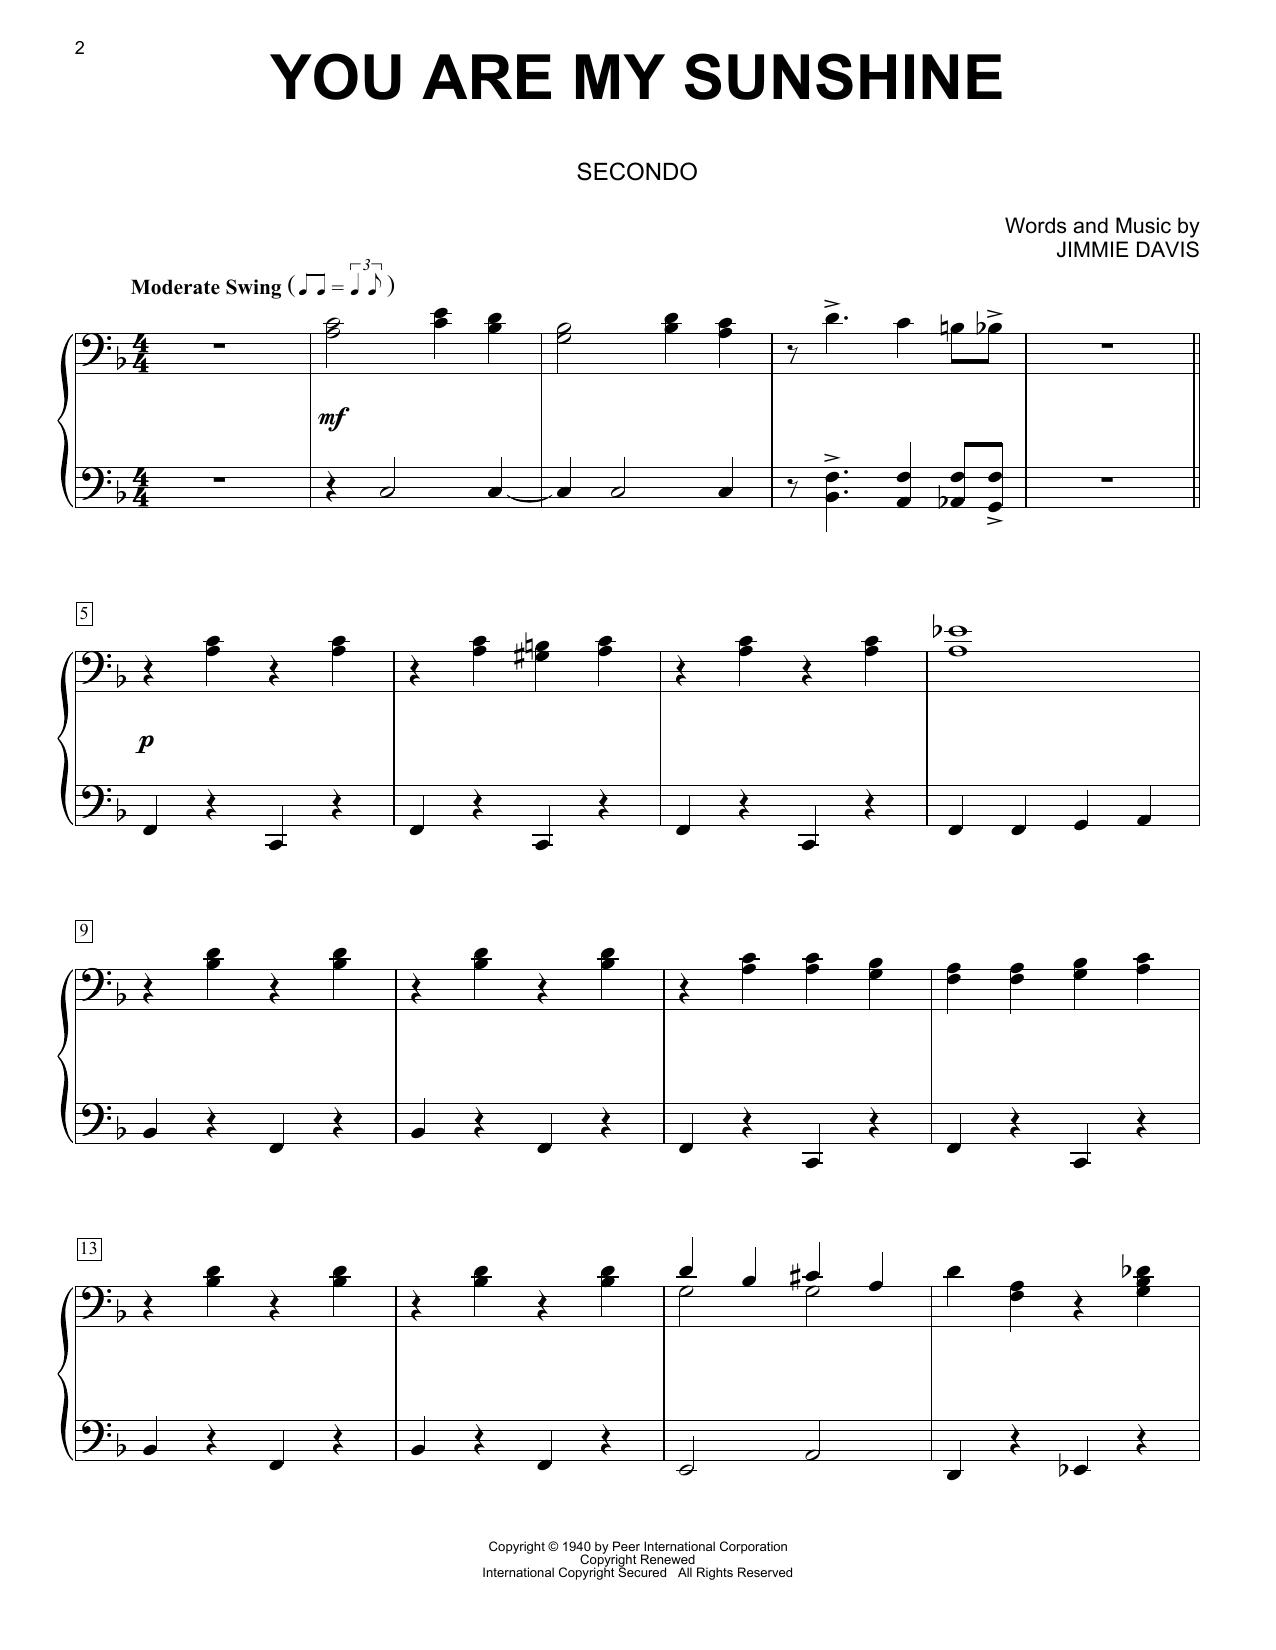 You Are My Sunshine Sheet Music